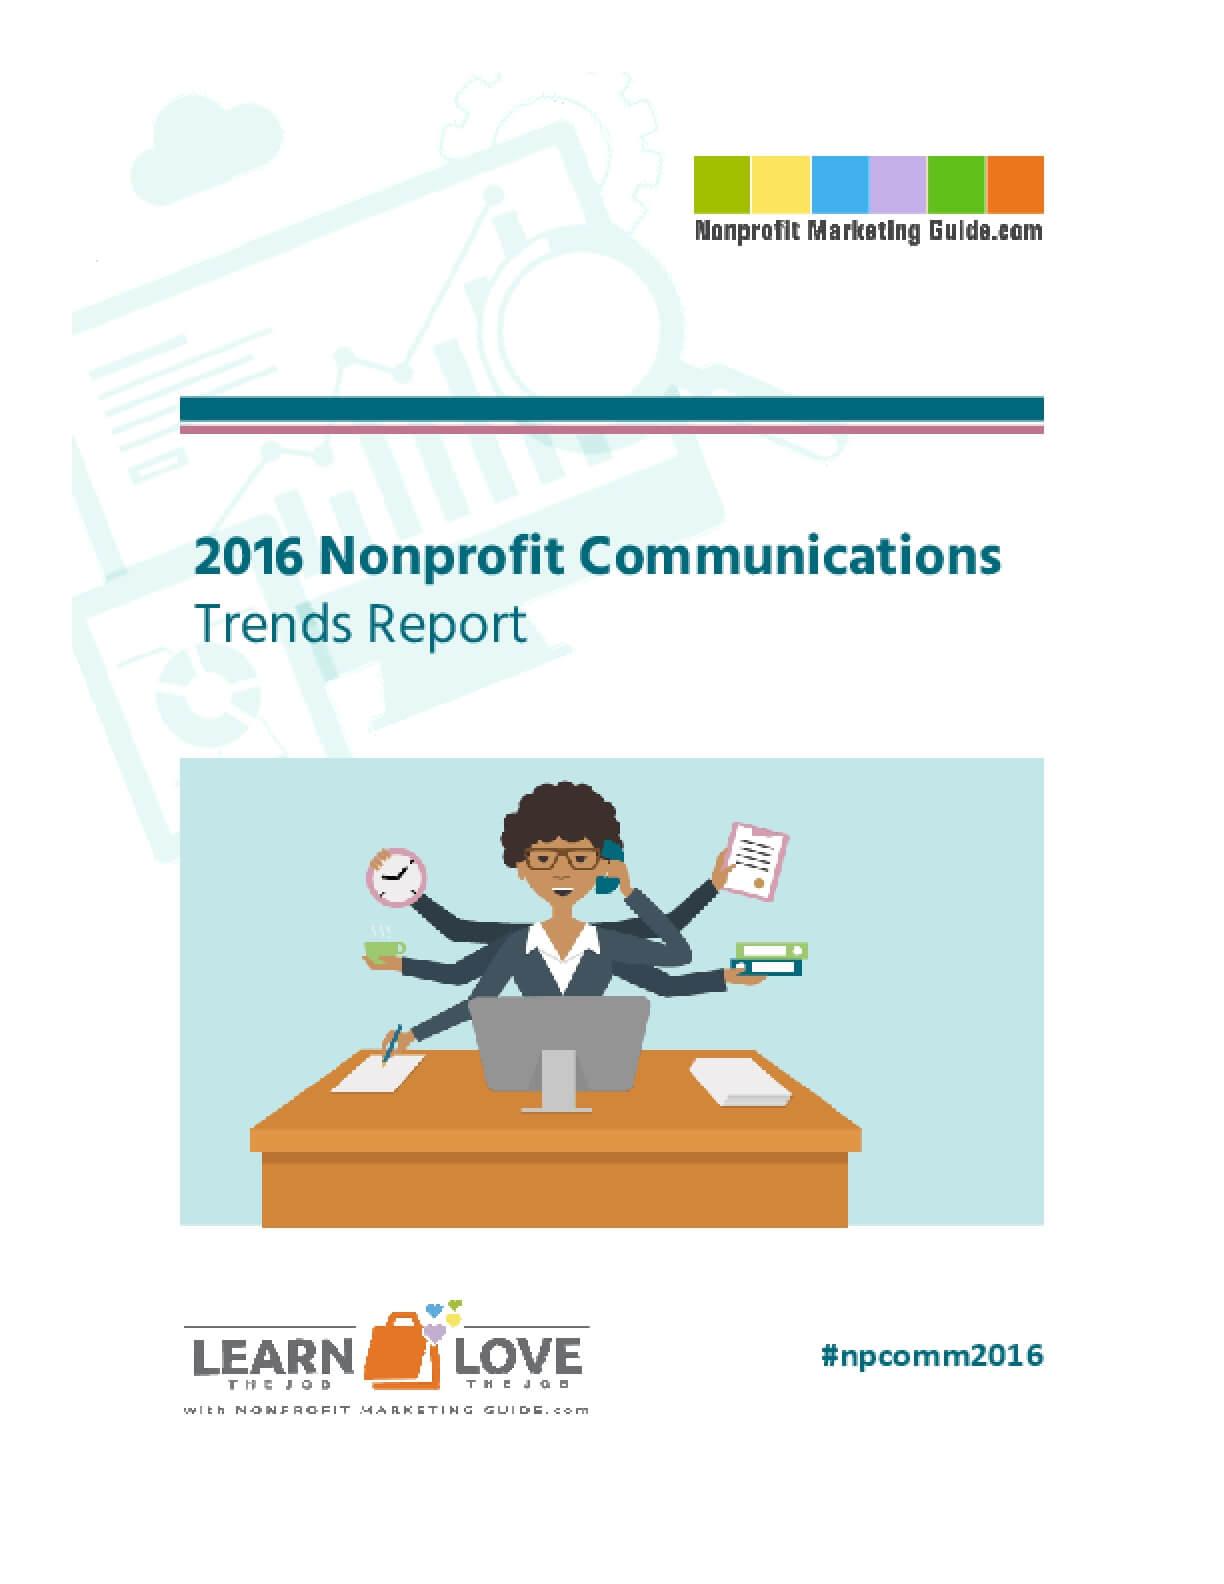 2016 Nonprofit Communications Trends Report